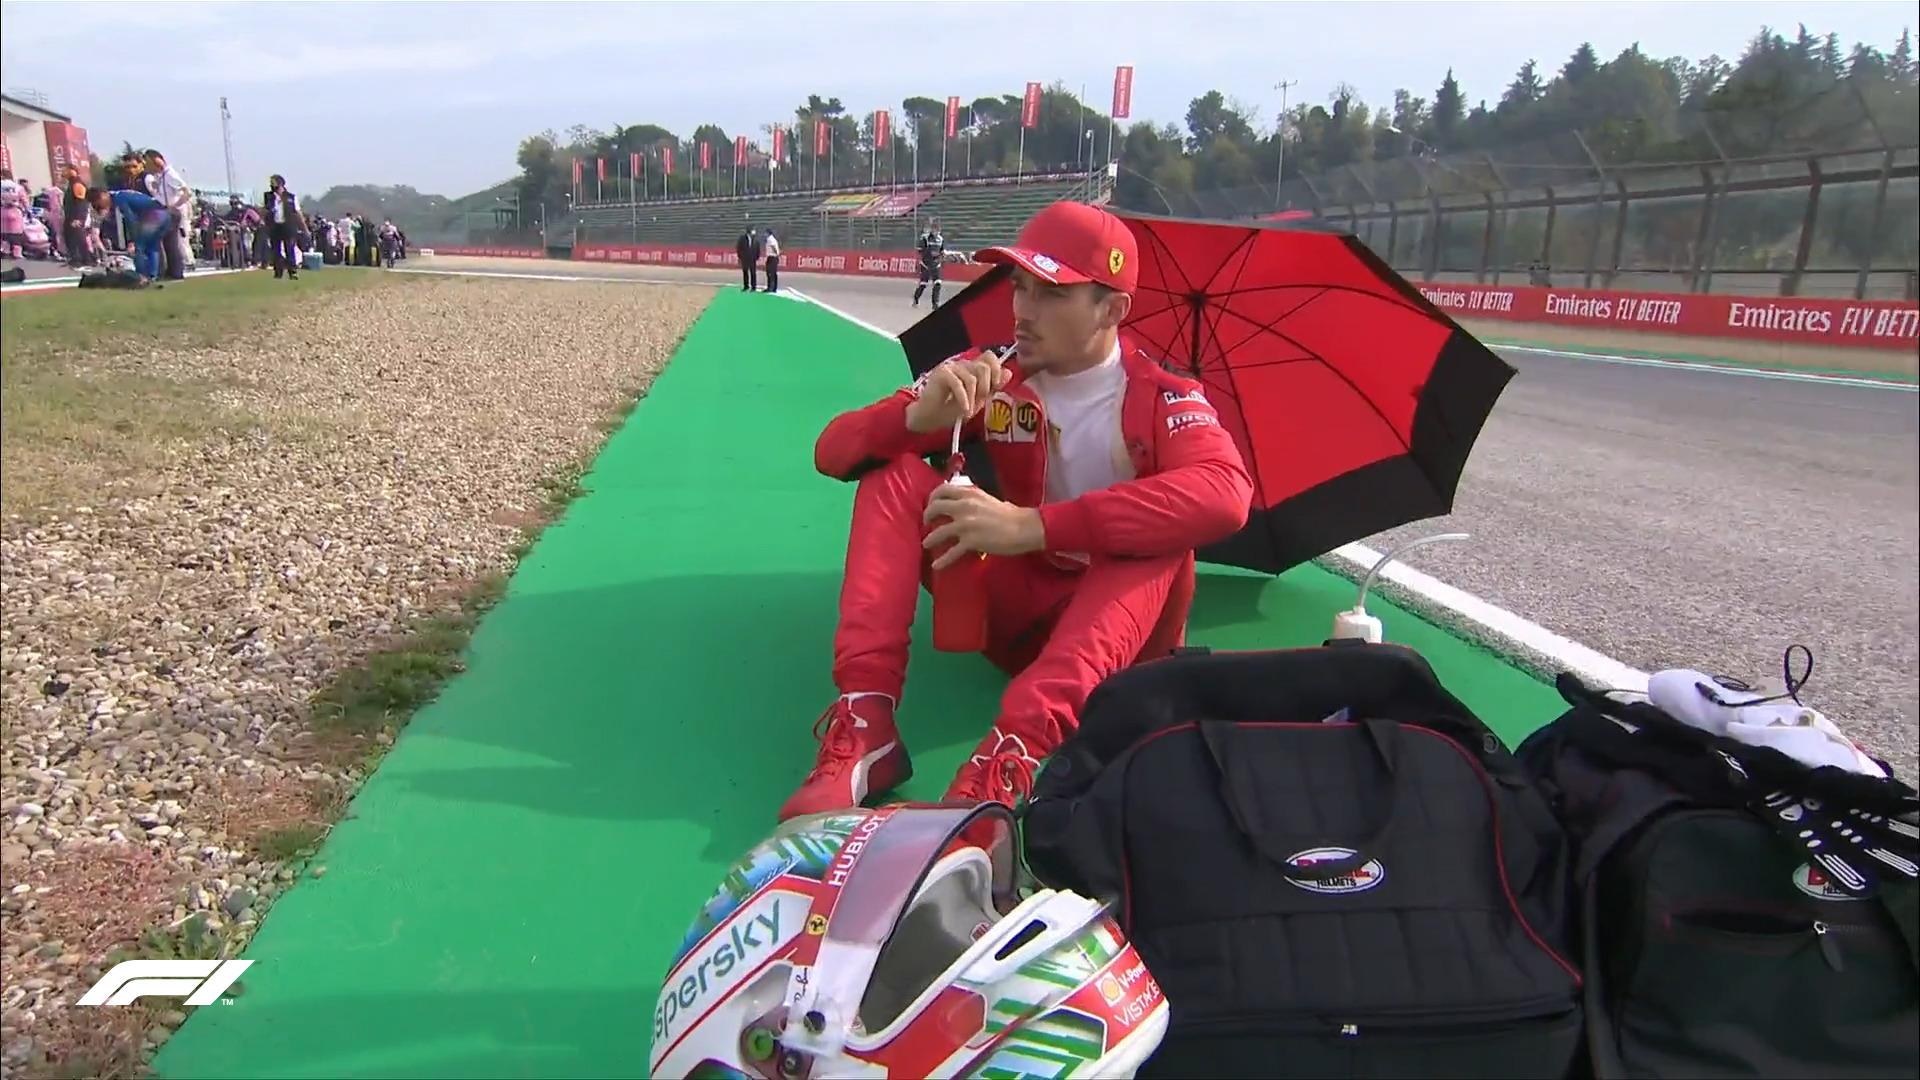 Live gara cronaca diretta GP emilia romagna Imola Risultati gara italia f1 formula 1 griglia di partenza